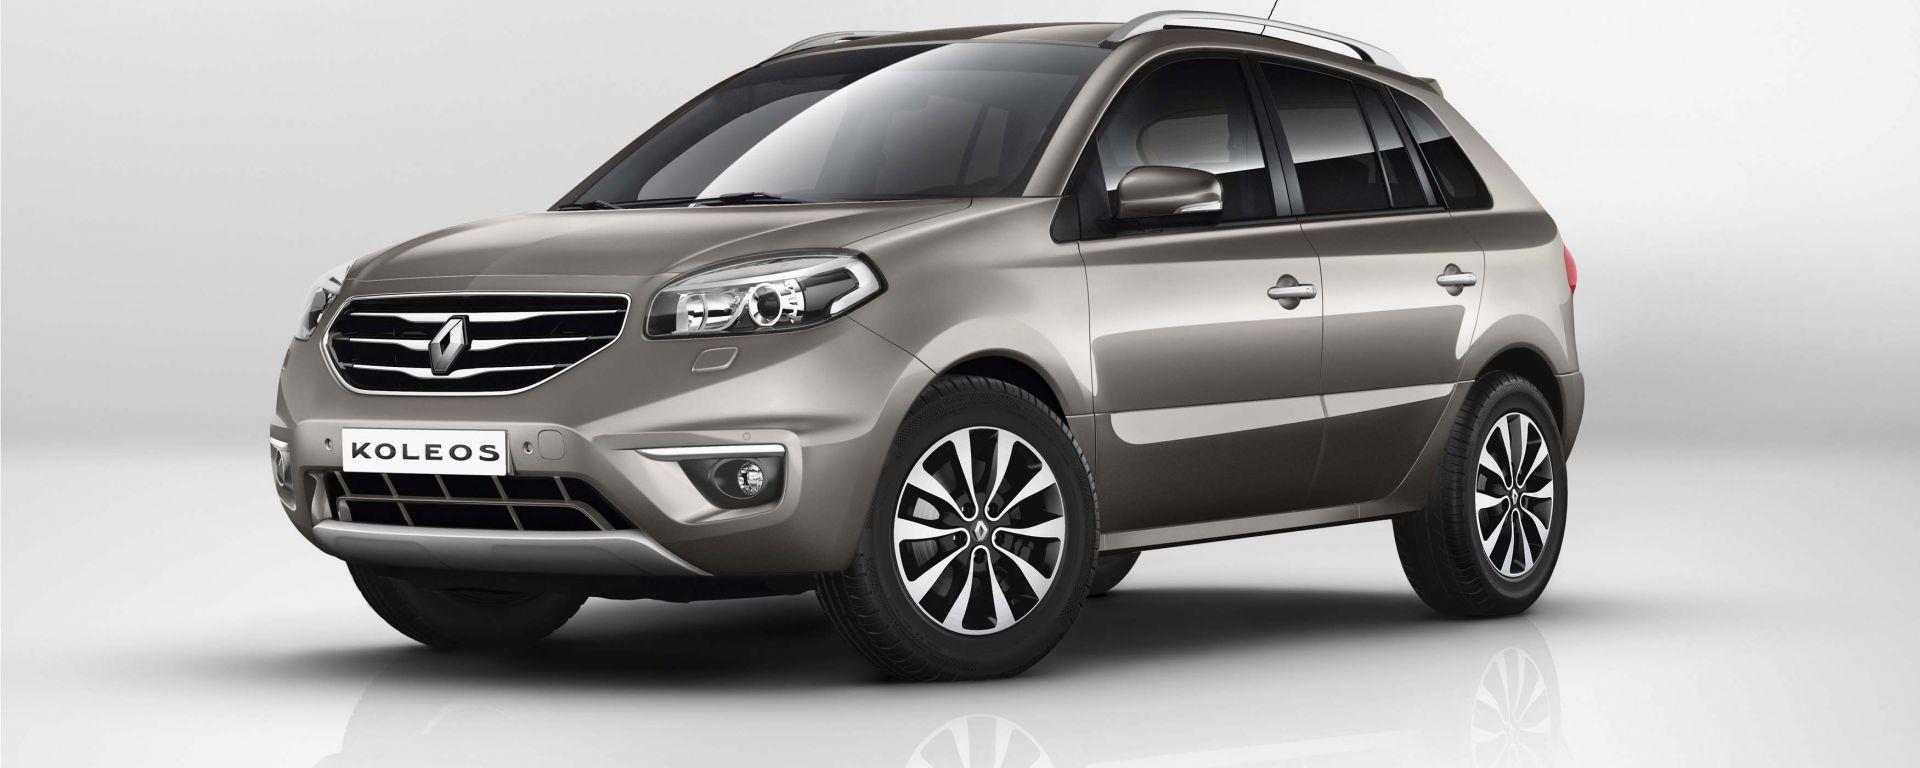 Nuova Renault Koleos